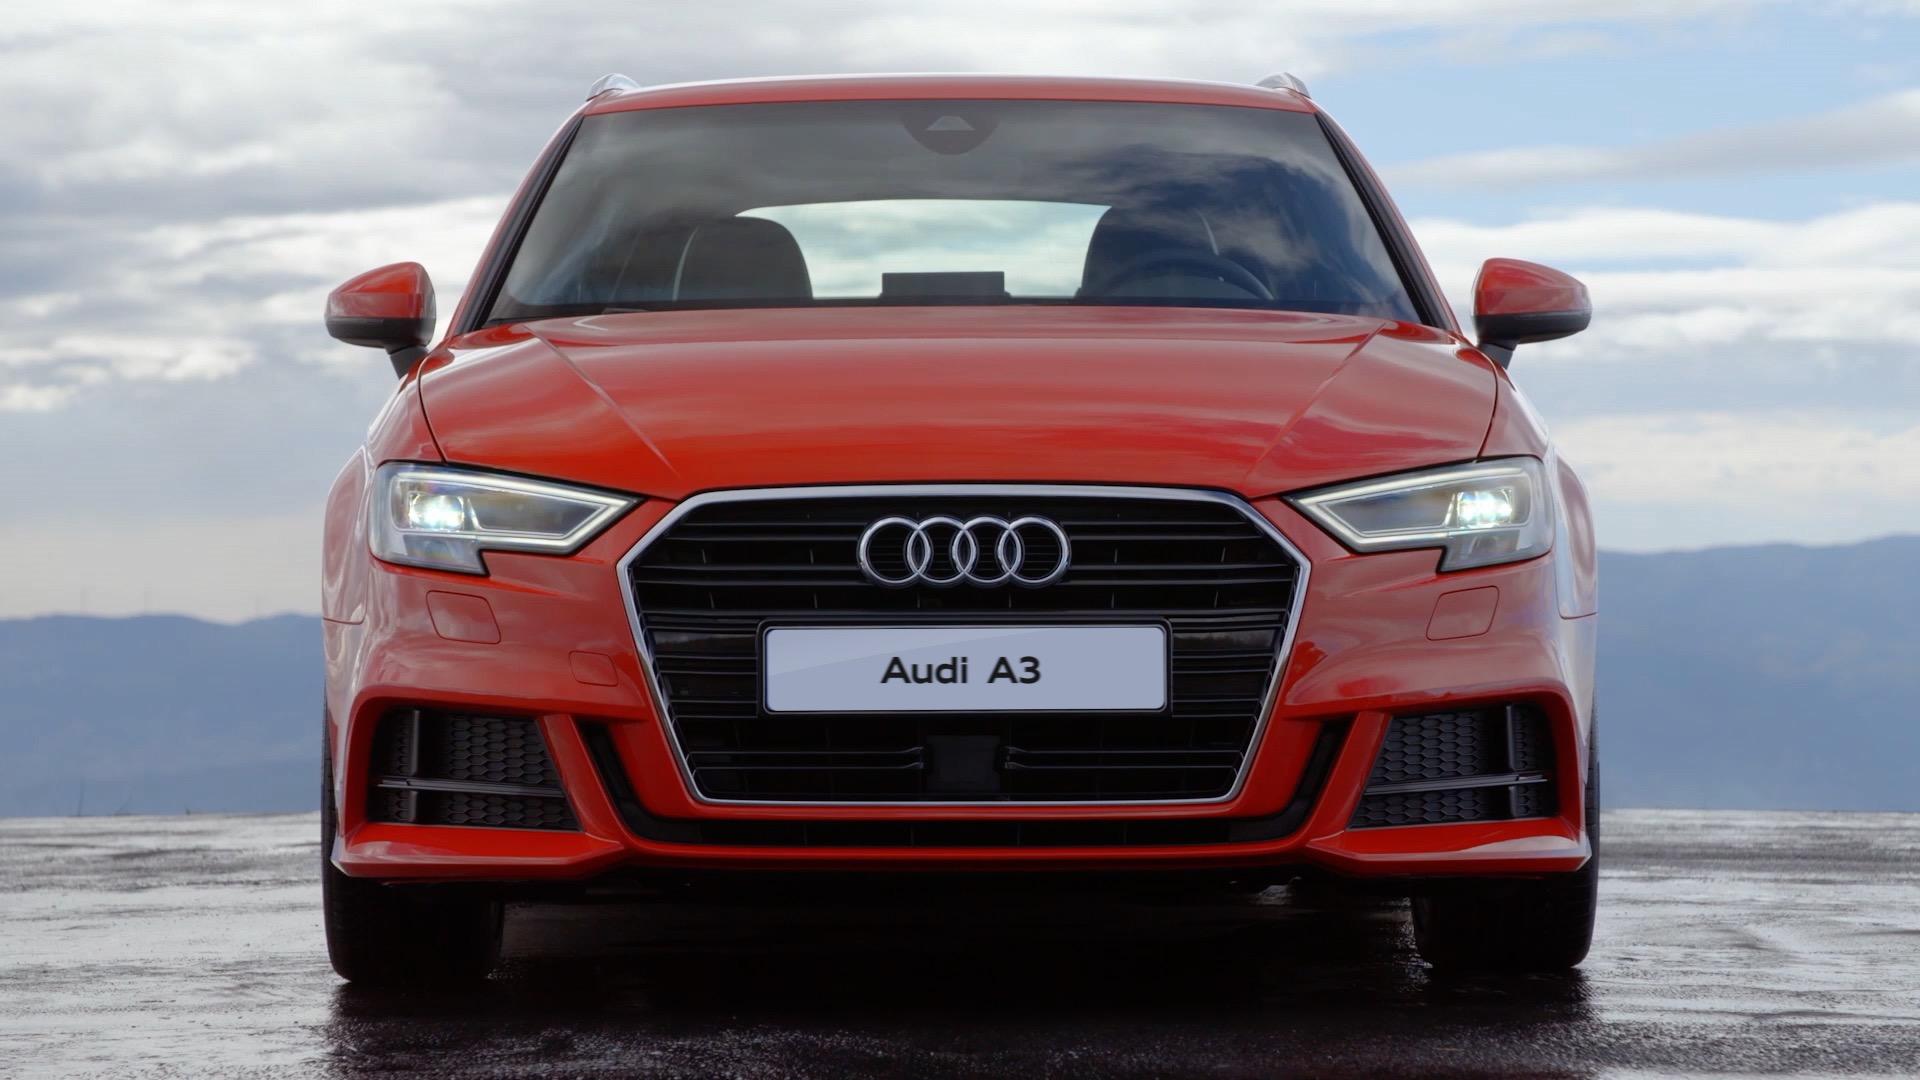 Audi A3 Sportback > A3 > FAW-Volkswagen Audi>Vorsprung durch Technik